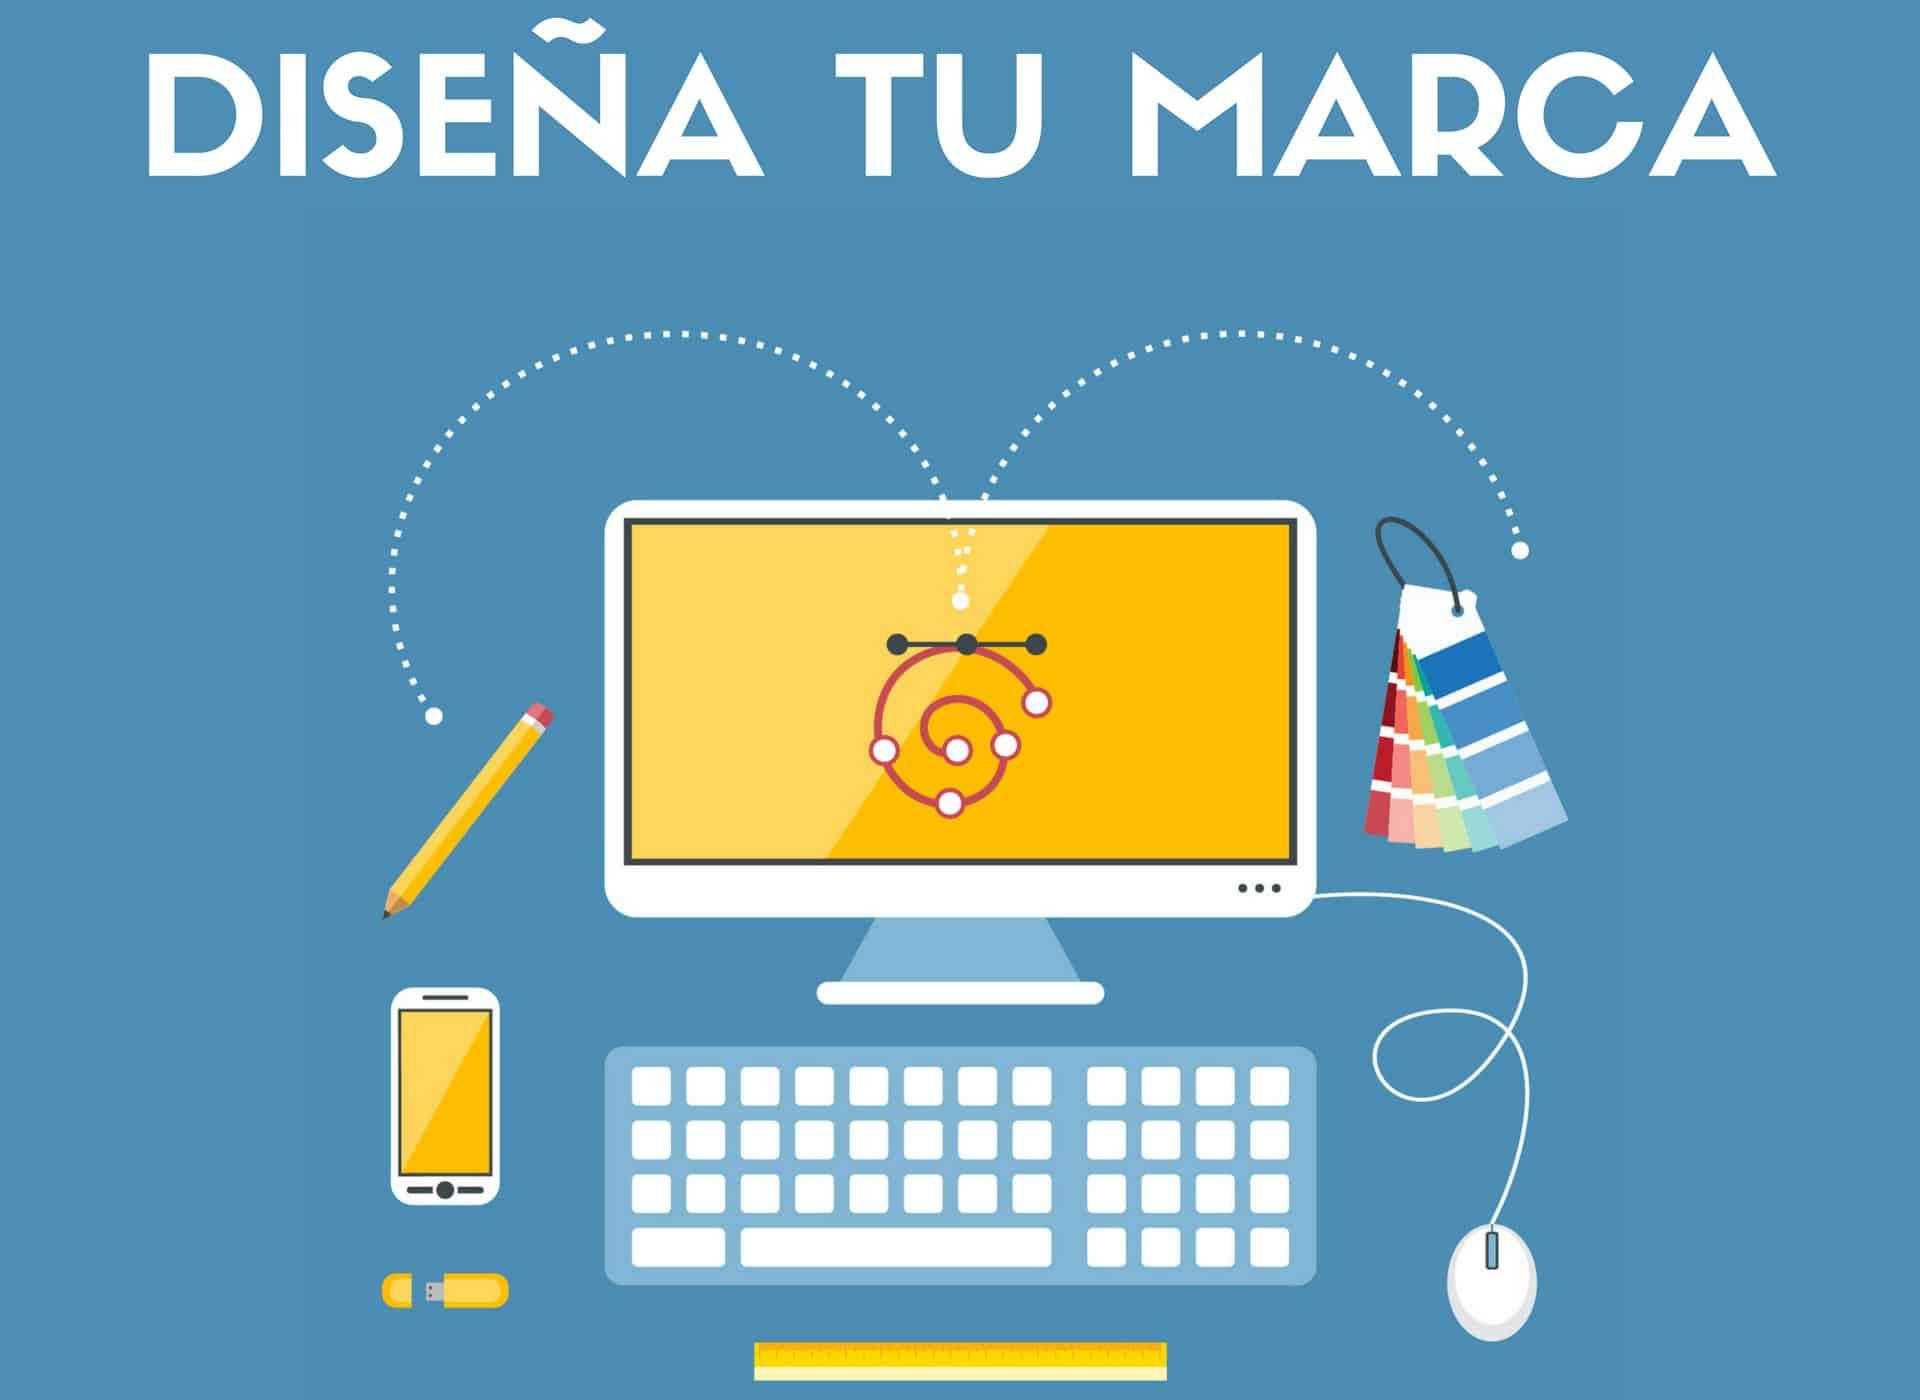 Curso Diseño gráfico - Maracaibo